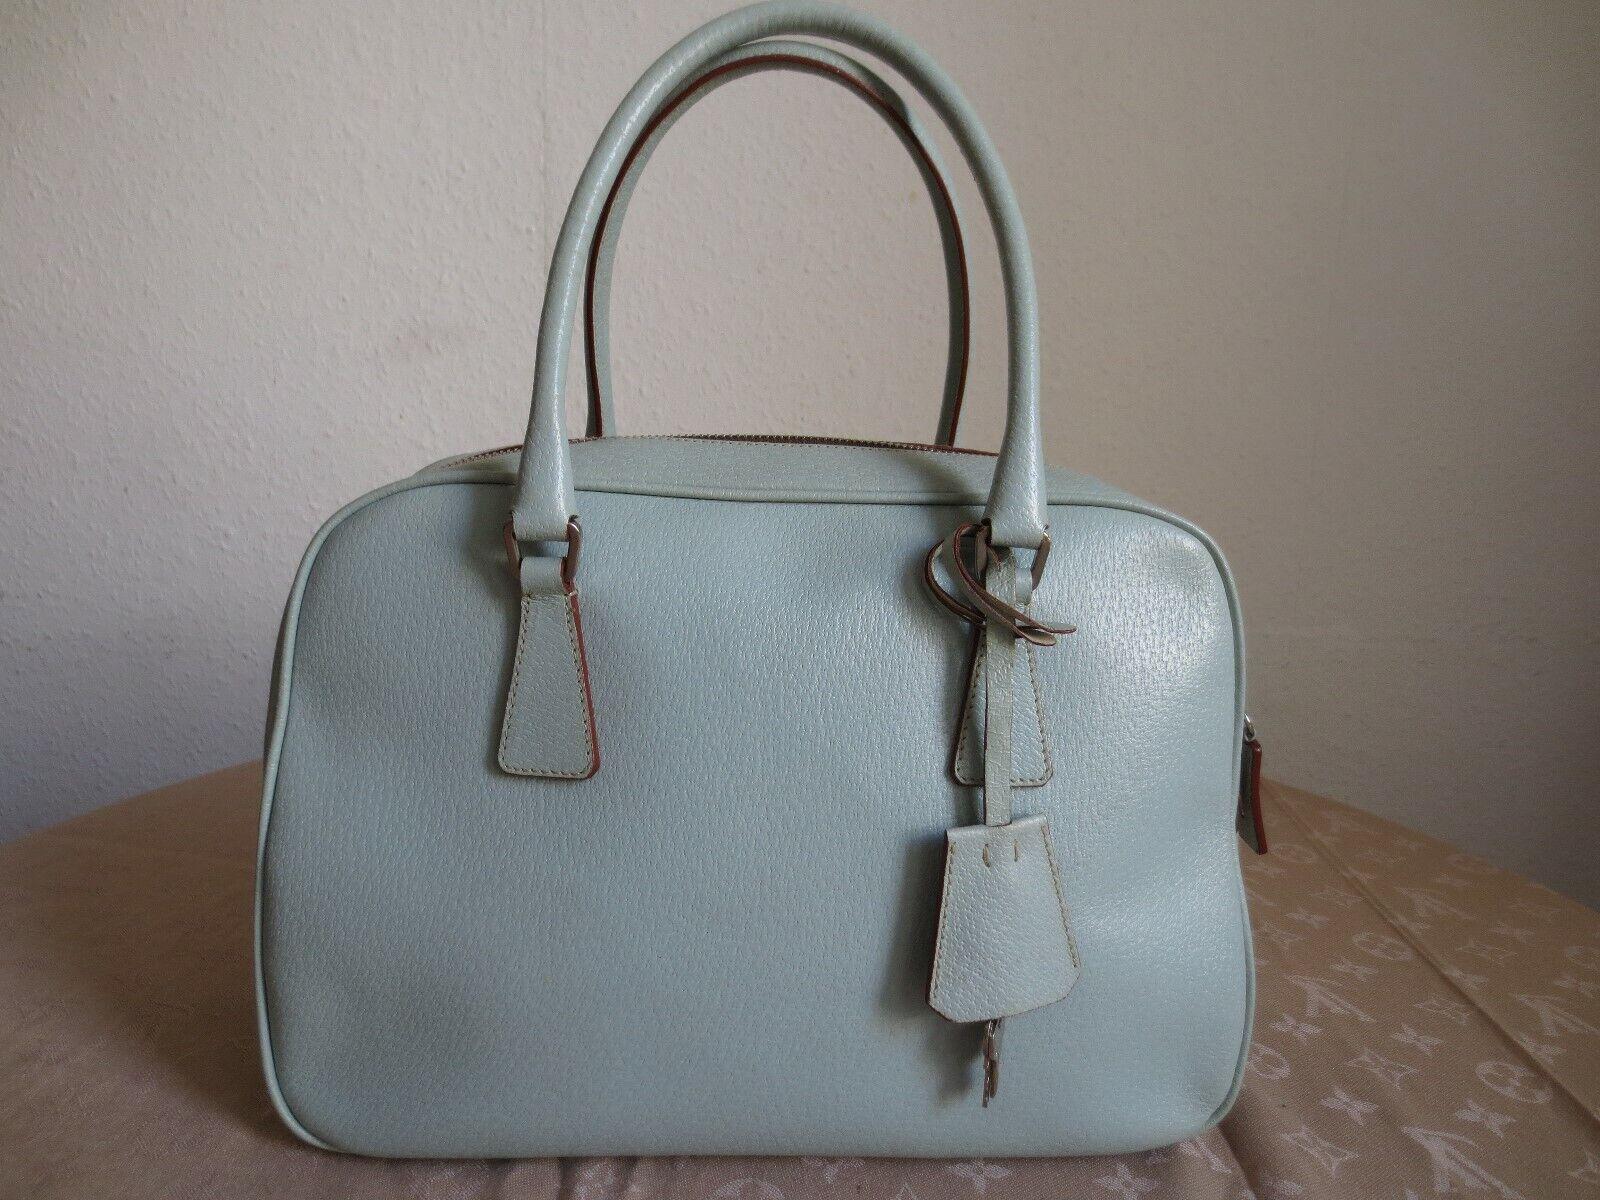 e1eafd01b2028 Prada Handtaschen Damen Test Vergleich +++ Prada Handtaschen Damen ...